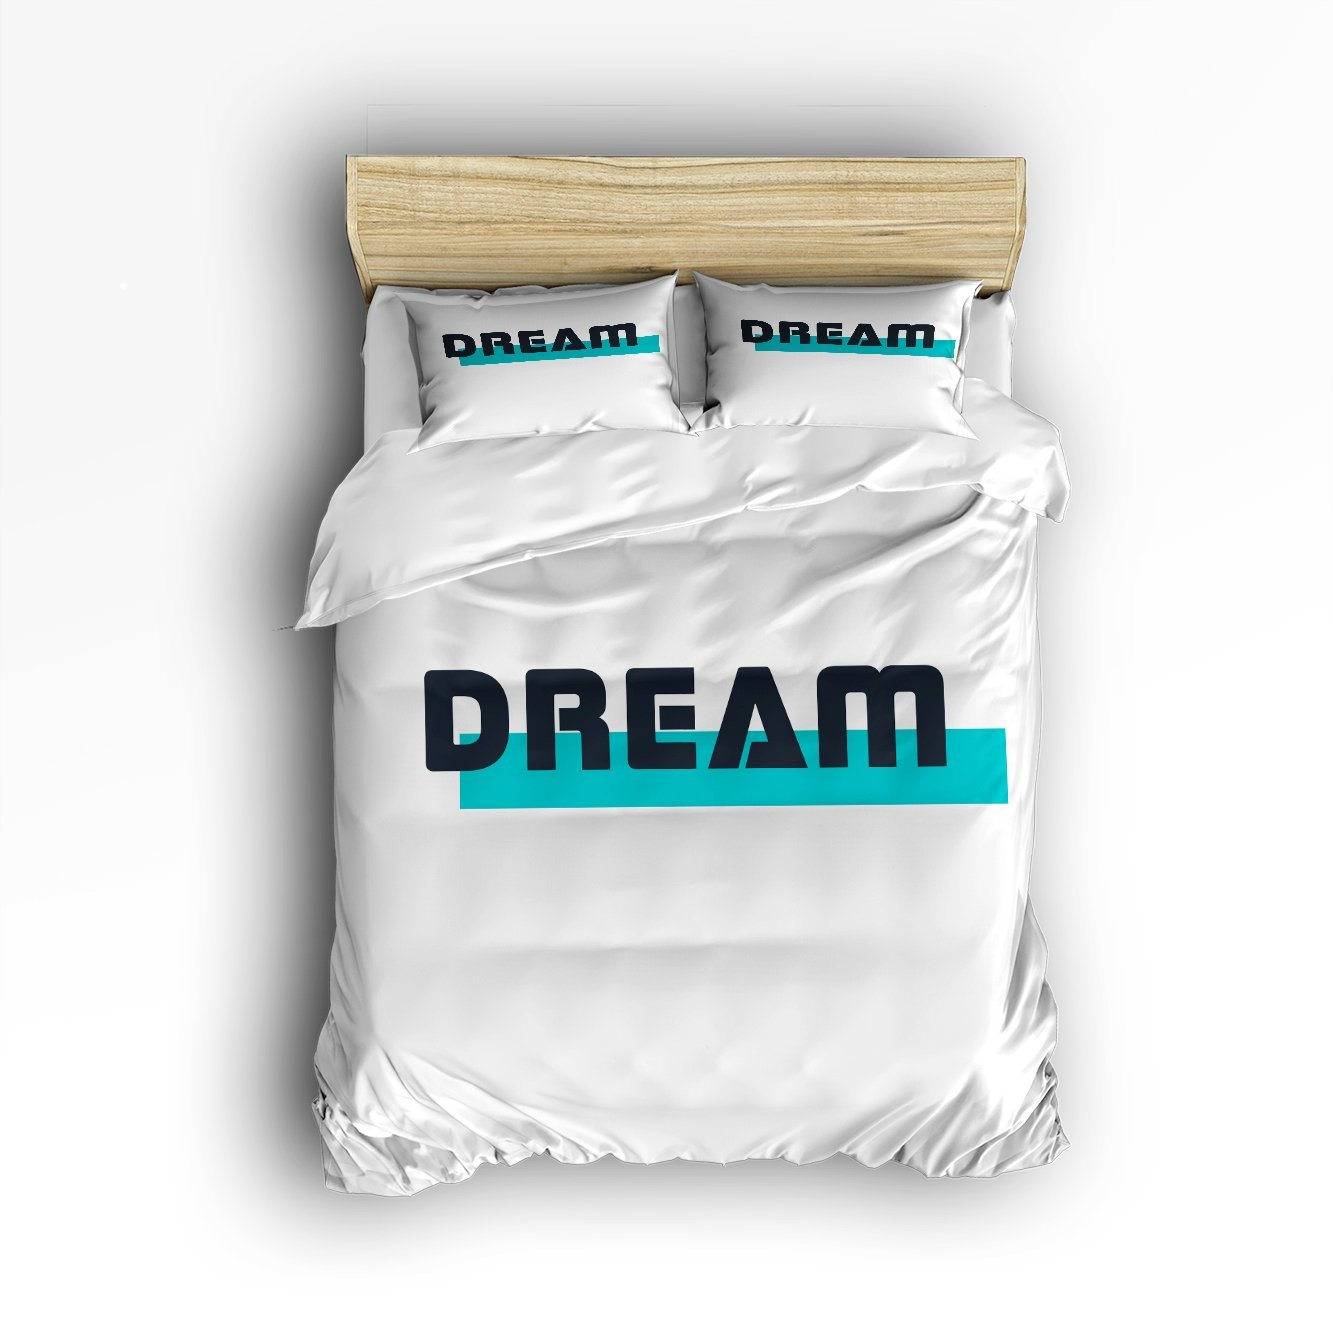 KAROLA Lightweight Microfiber Duvet Cover Set Luxury Soft Duvet Cover Set - Hotel Quality & Hypoallergenic with Zippered Closure DREAM